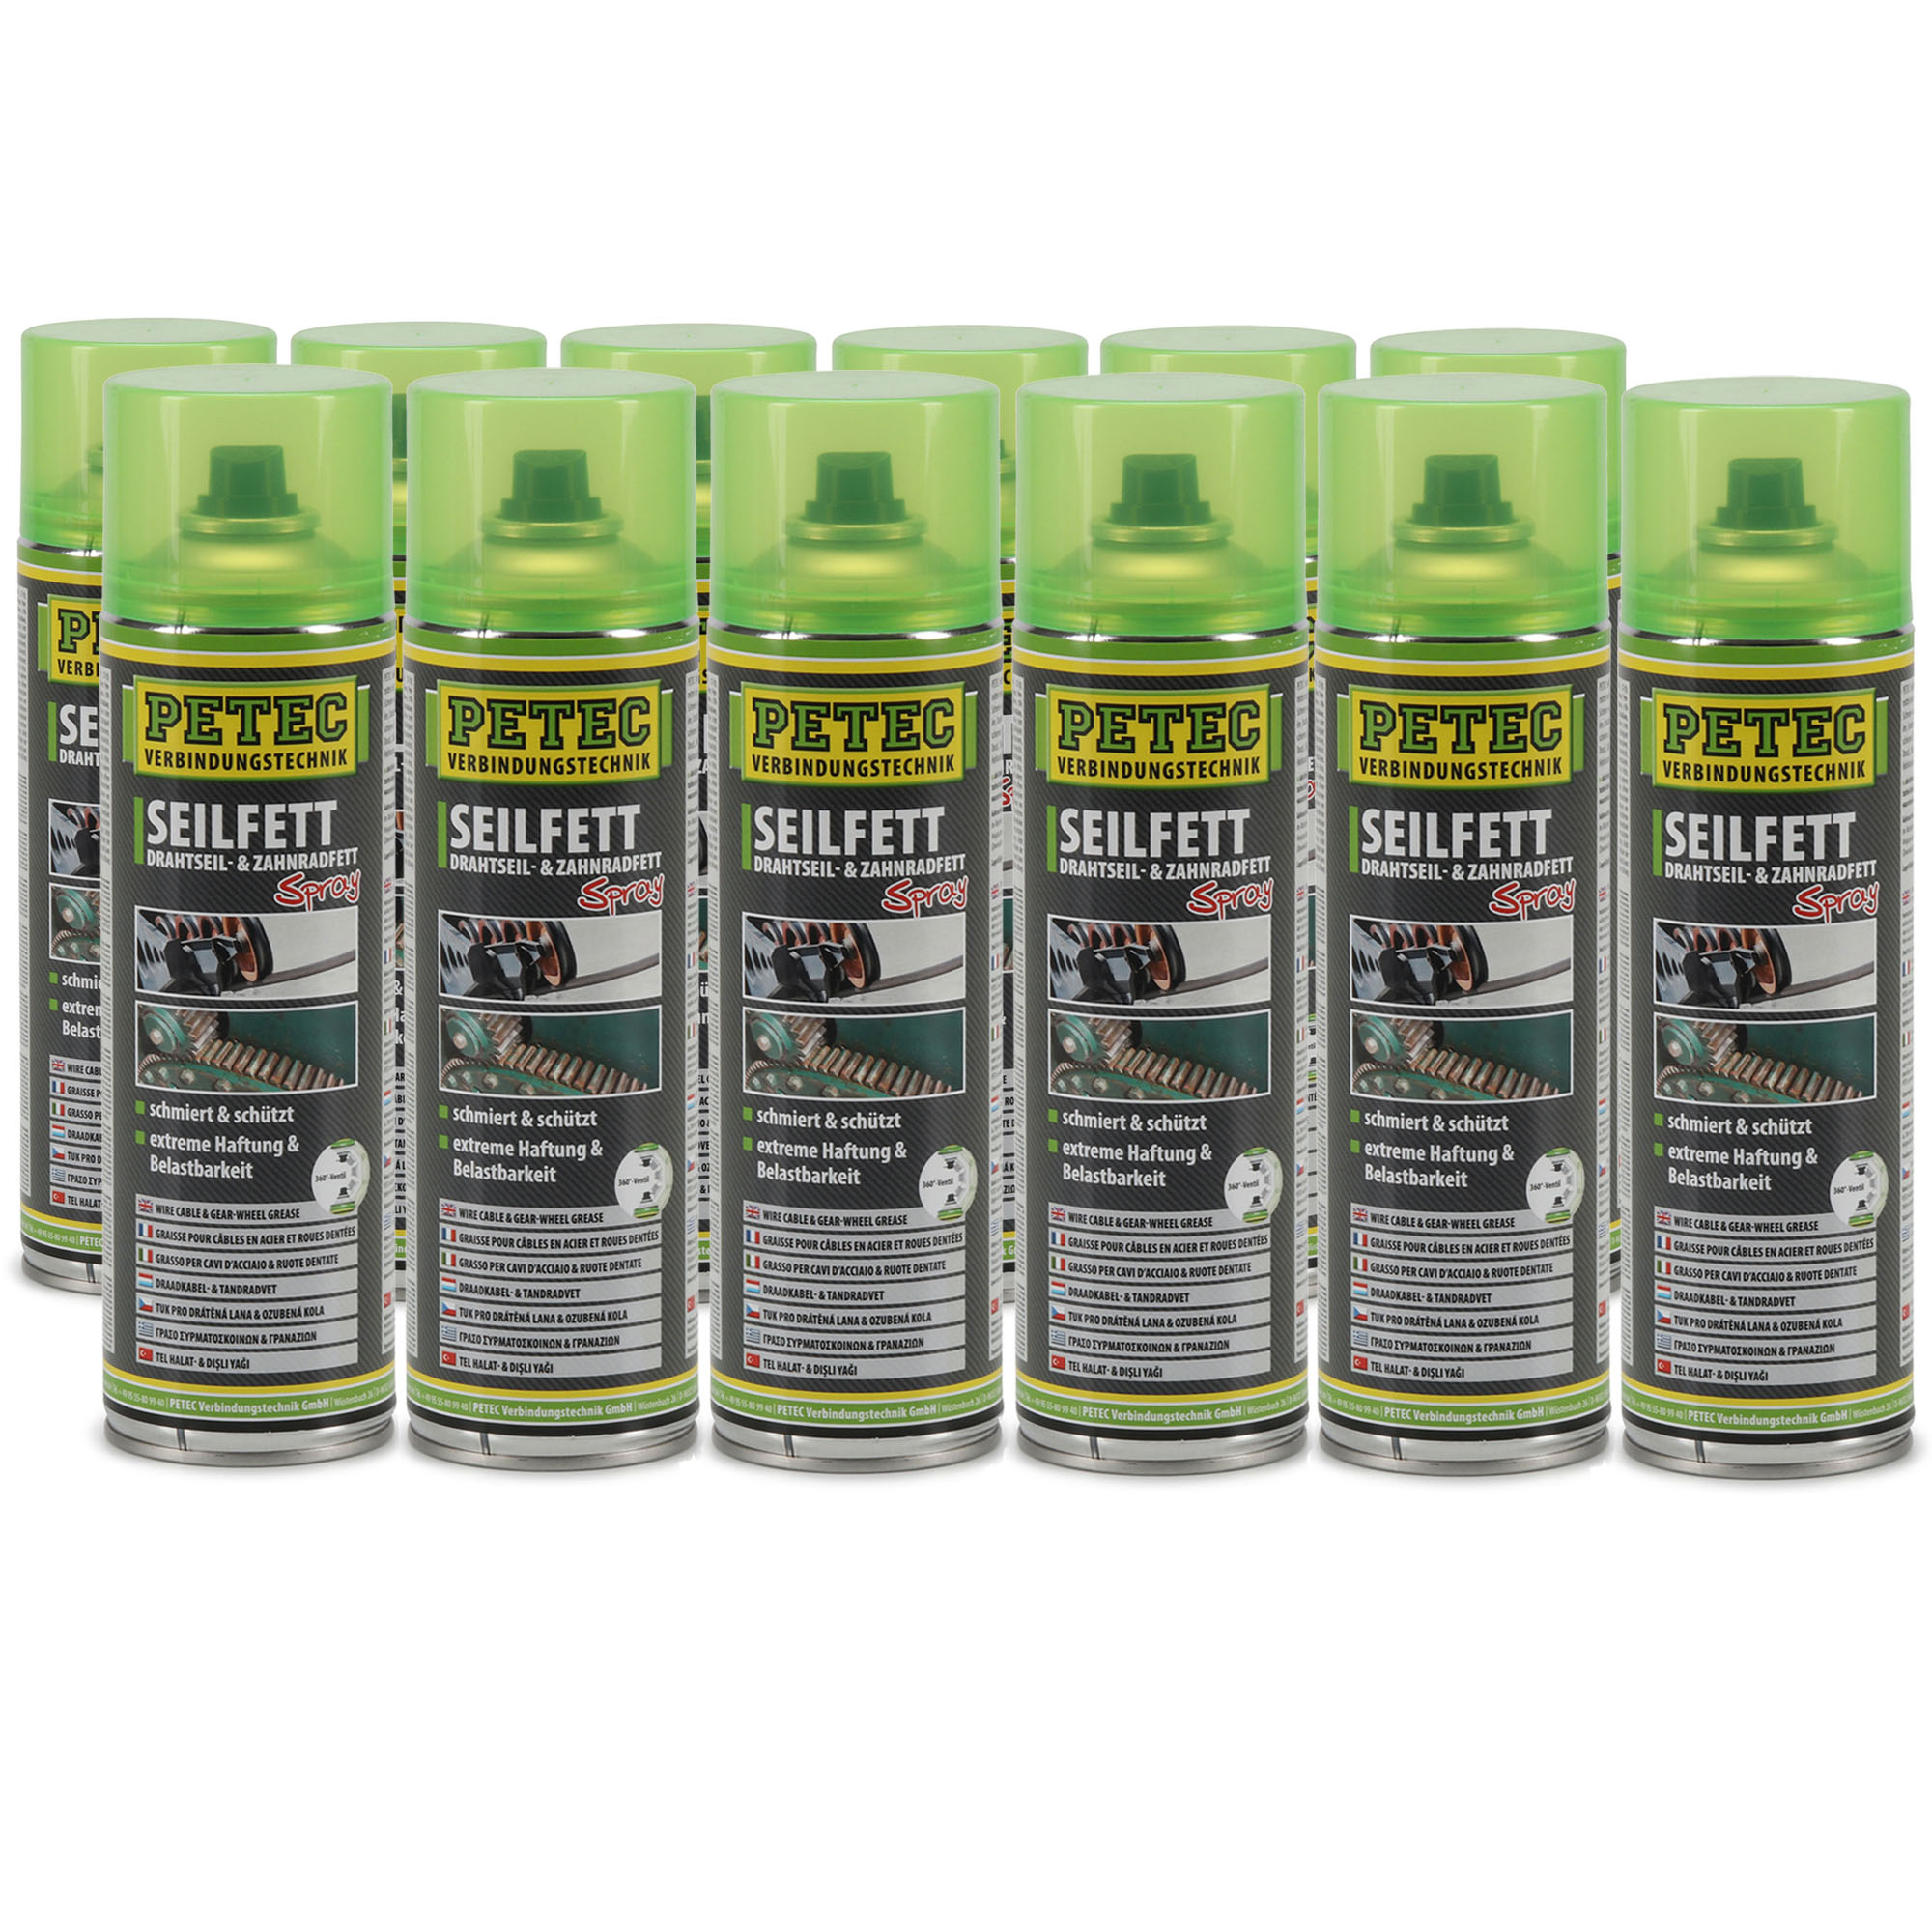 PETEC 71650 Seilfett Seilfettspray Drahtseilfett Zahnradfett Fettspray 12x 500ml